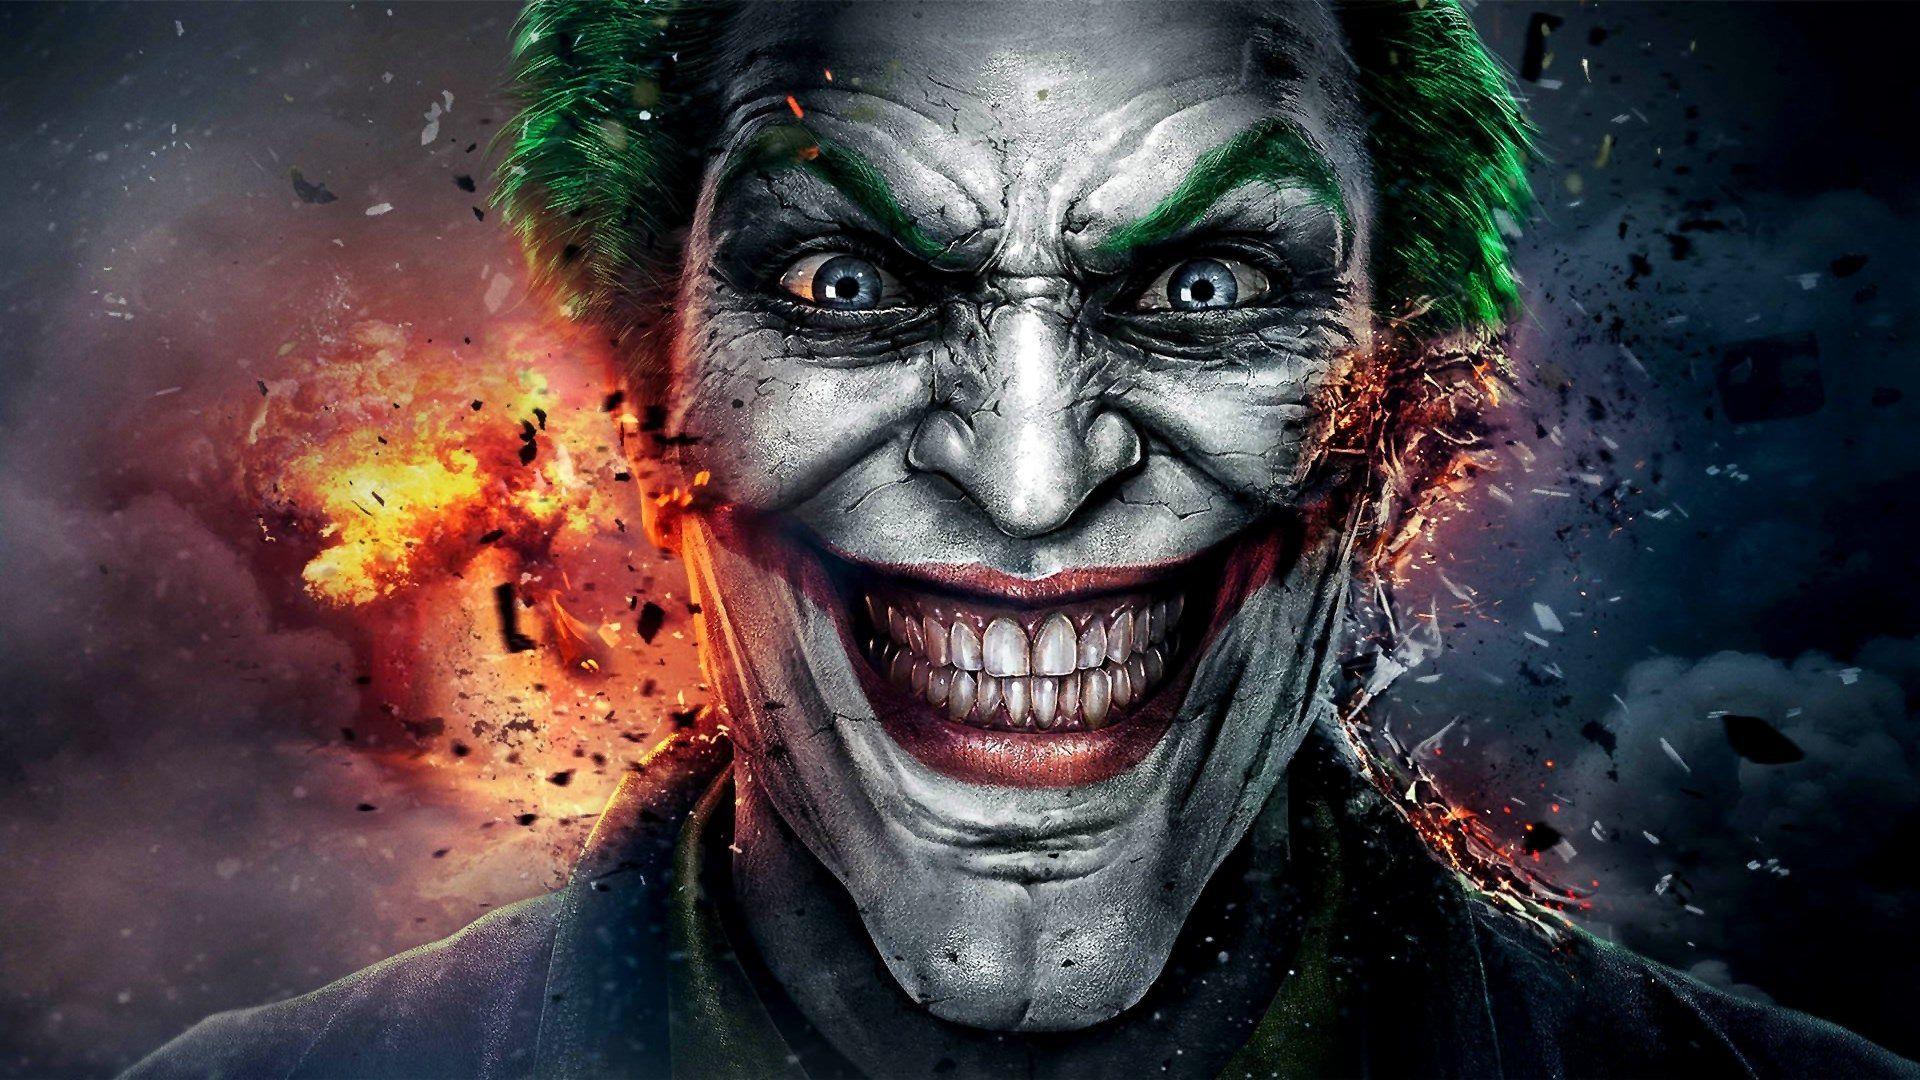 Cartoon Joker Wallpaper Download